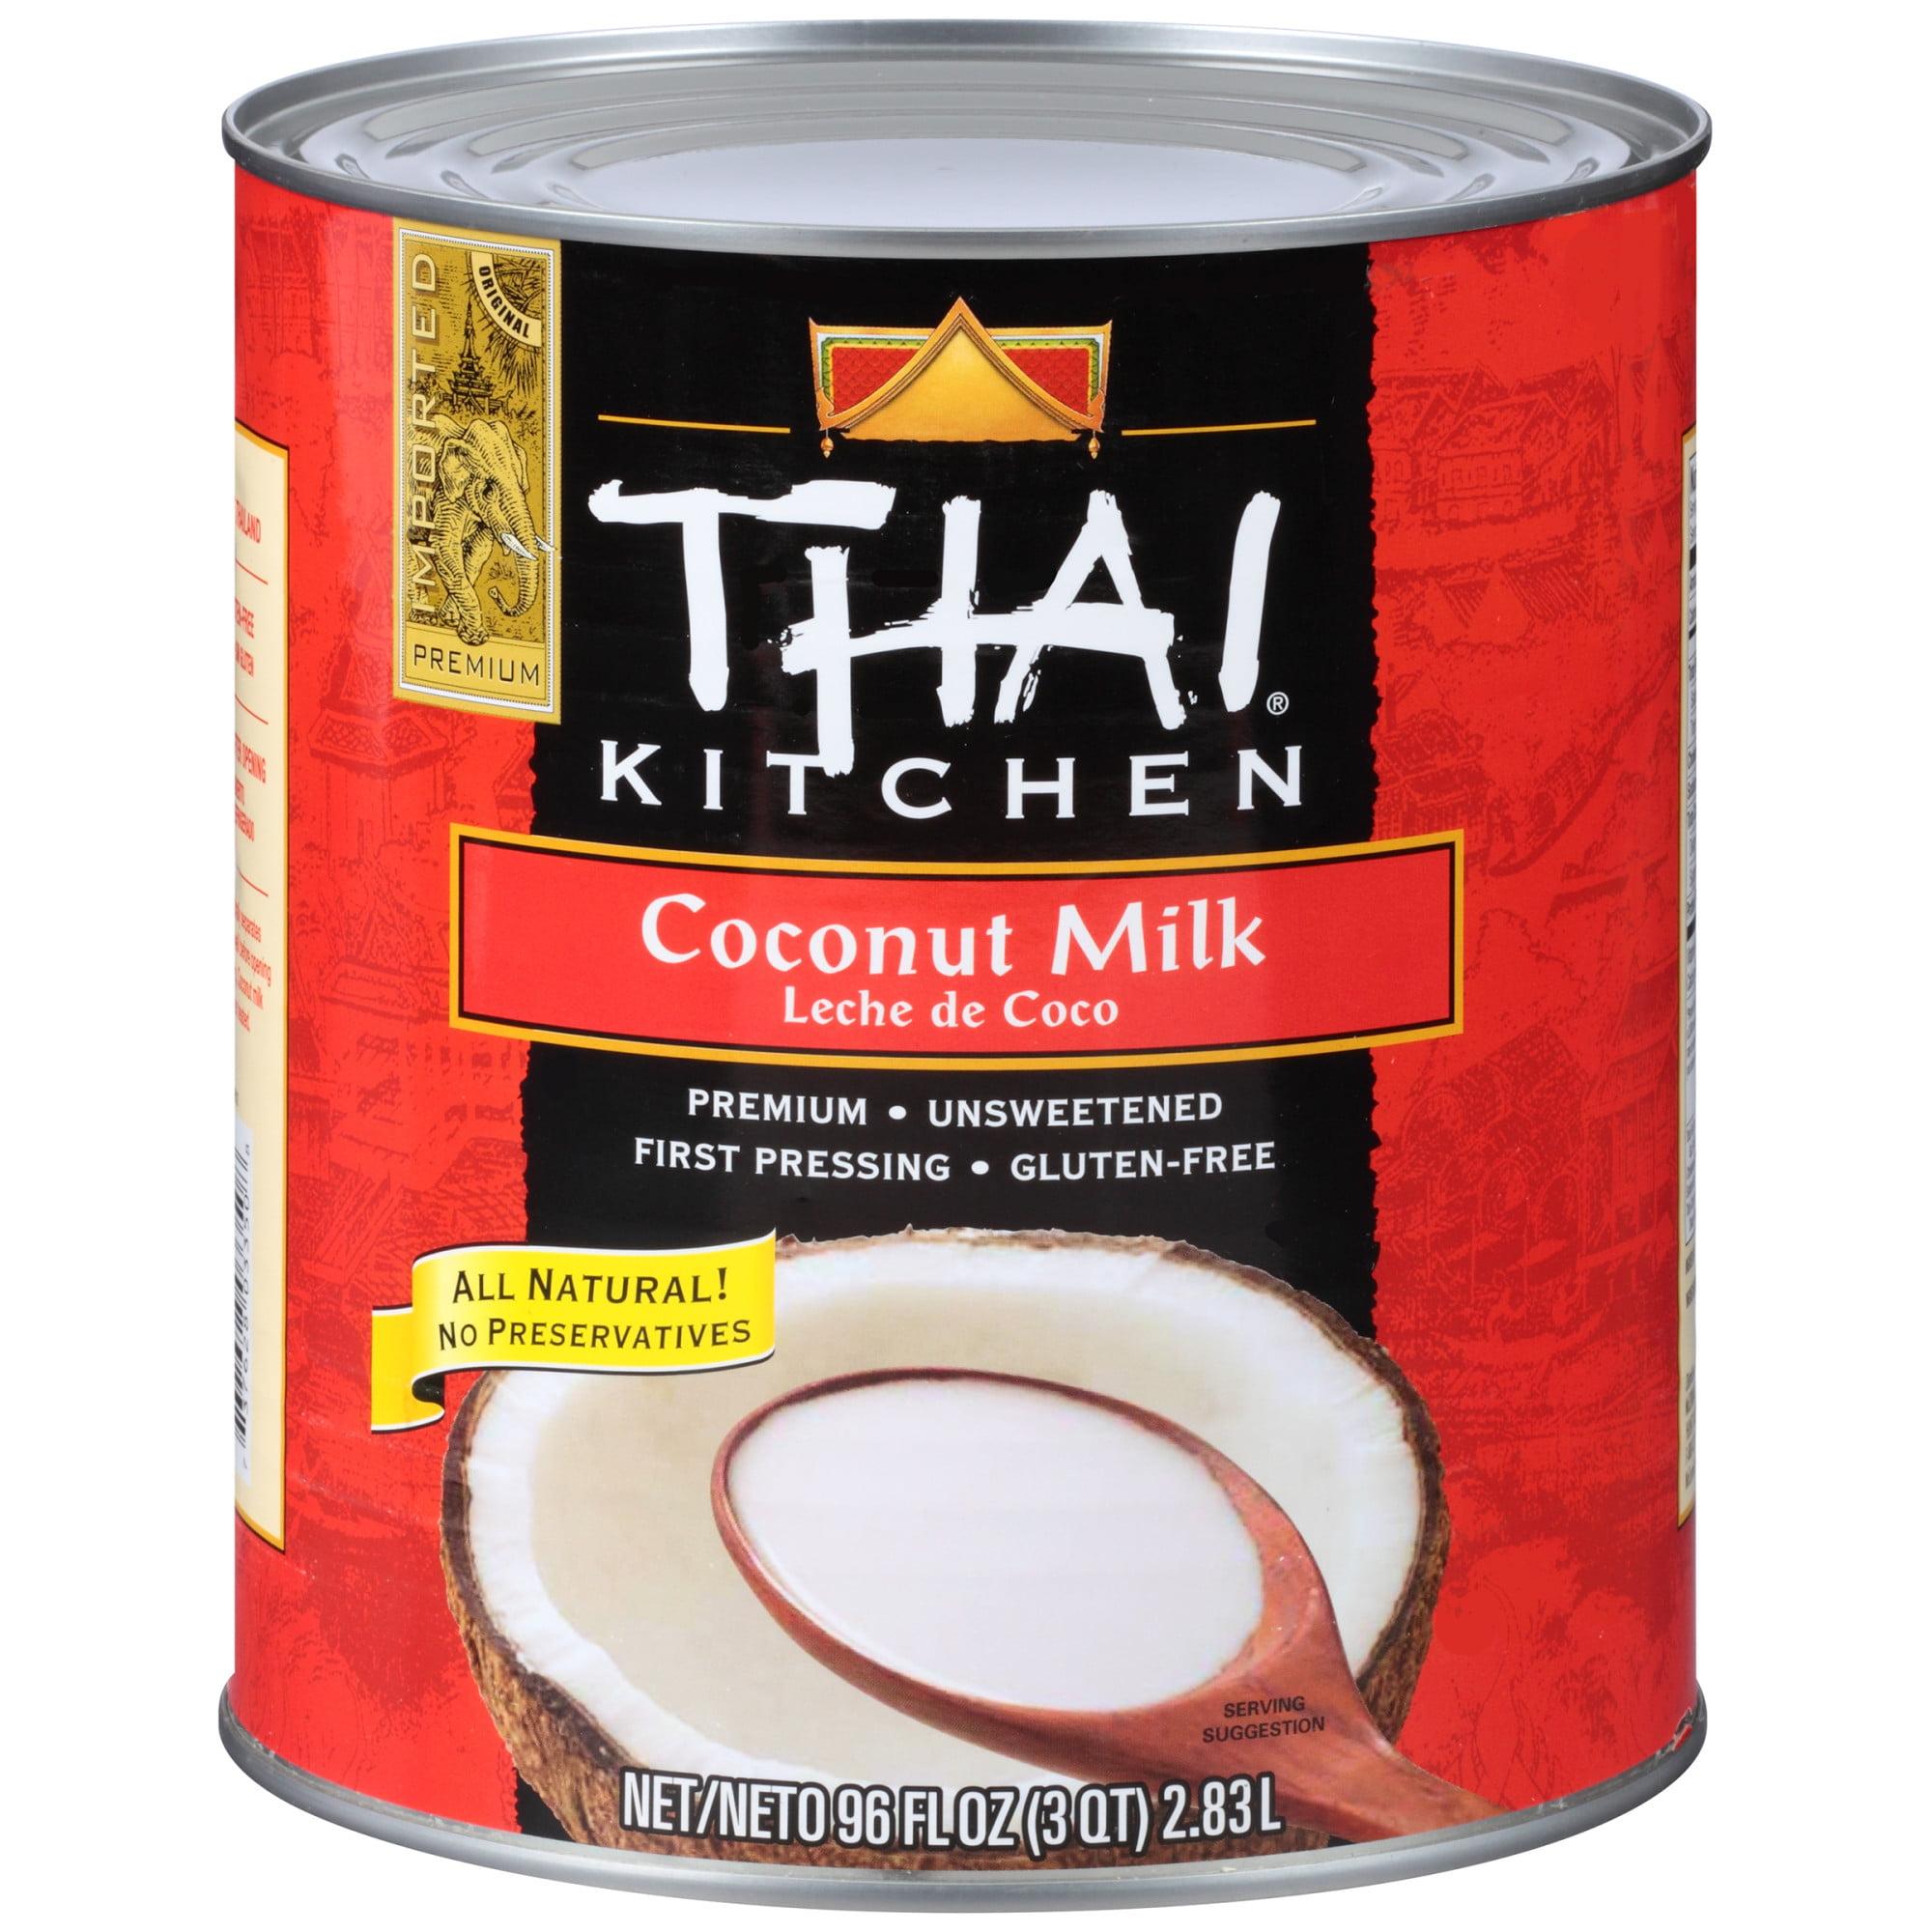 Thai Kitchen 2: Thai Kitchen Coconut Milk, 96 Oz